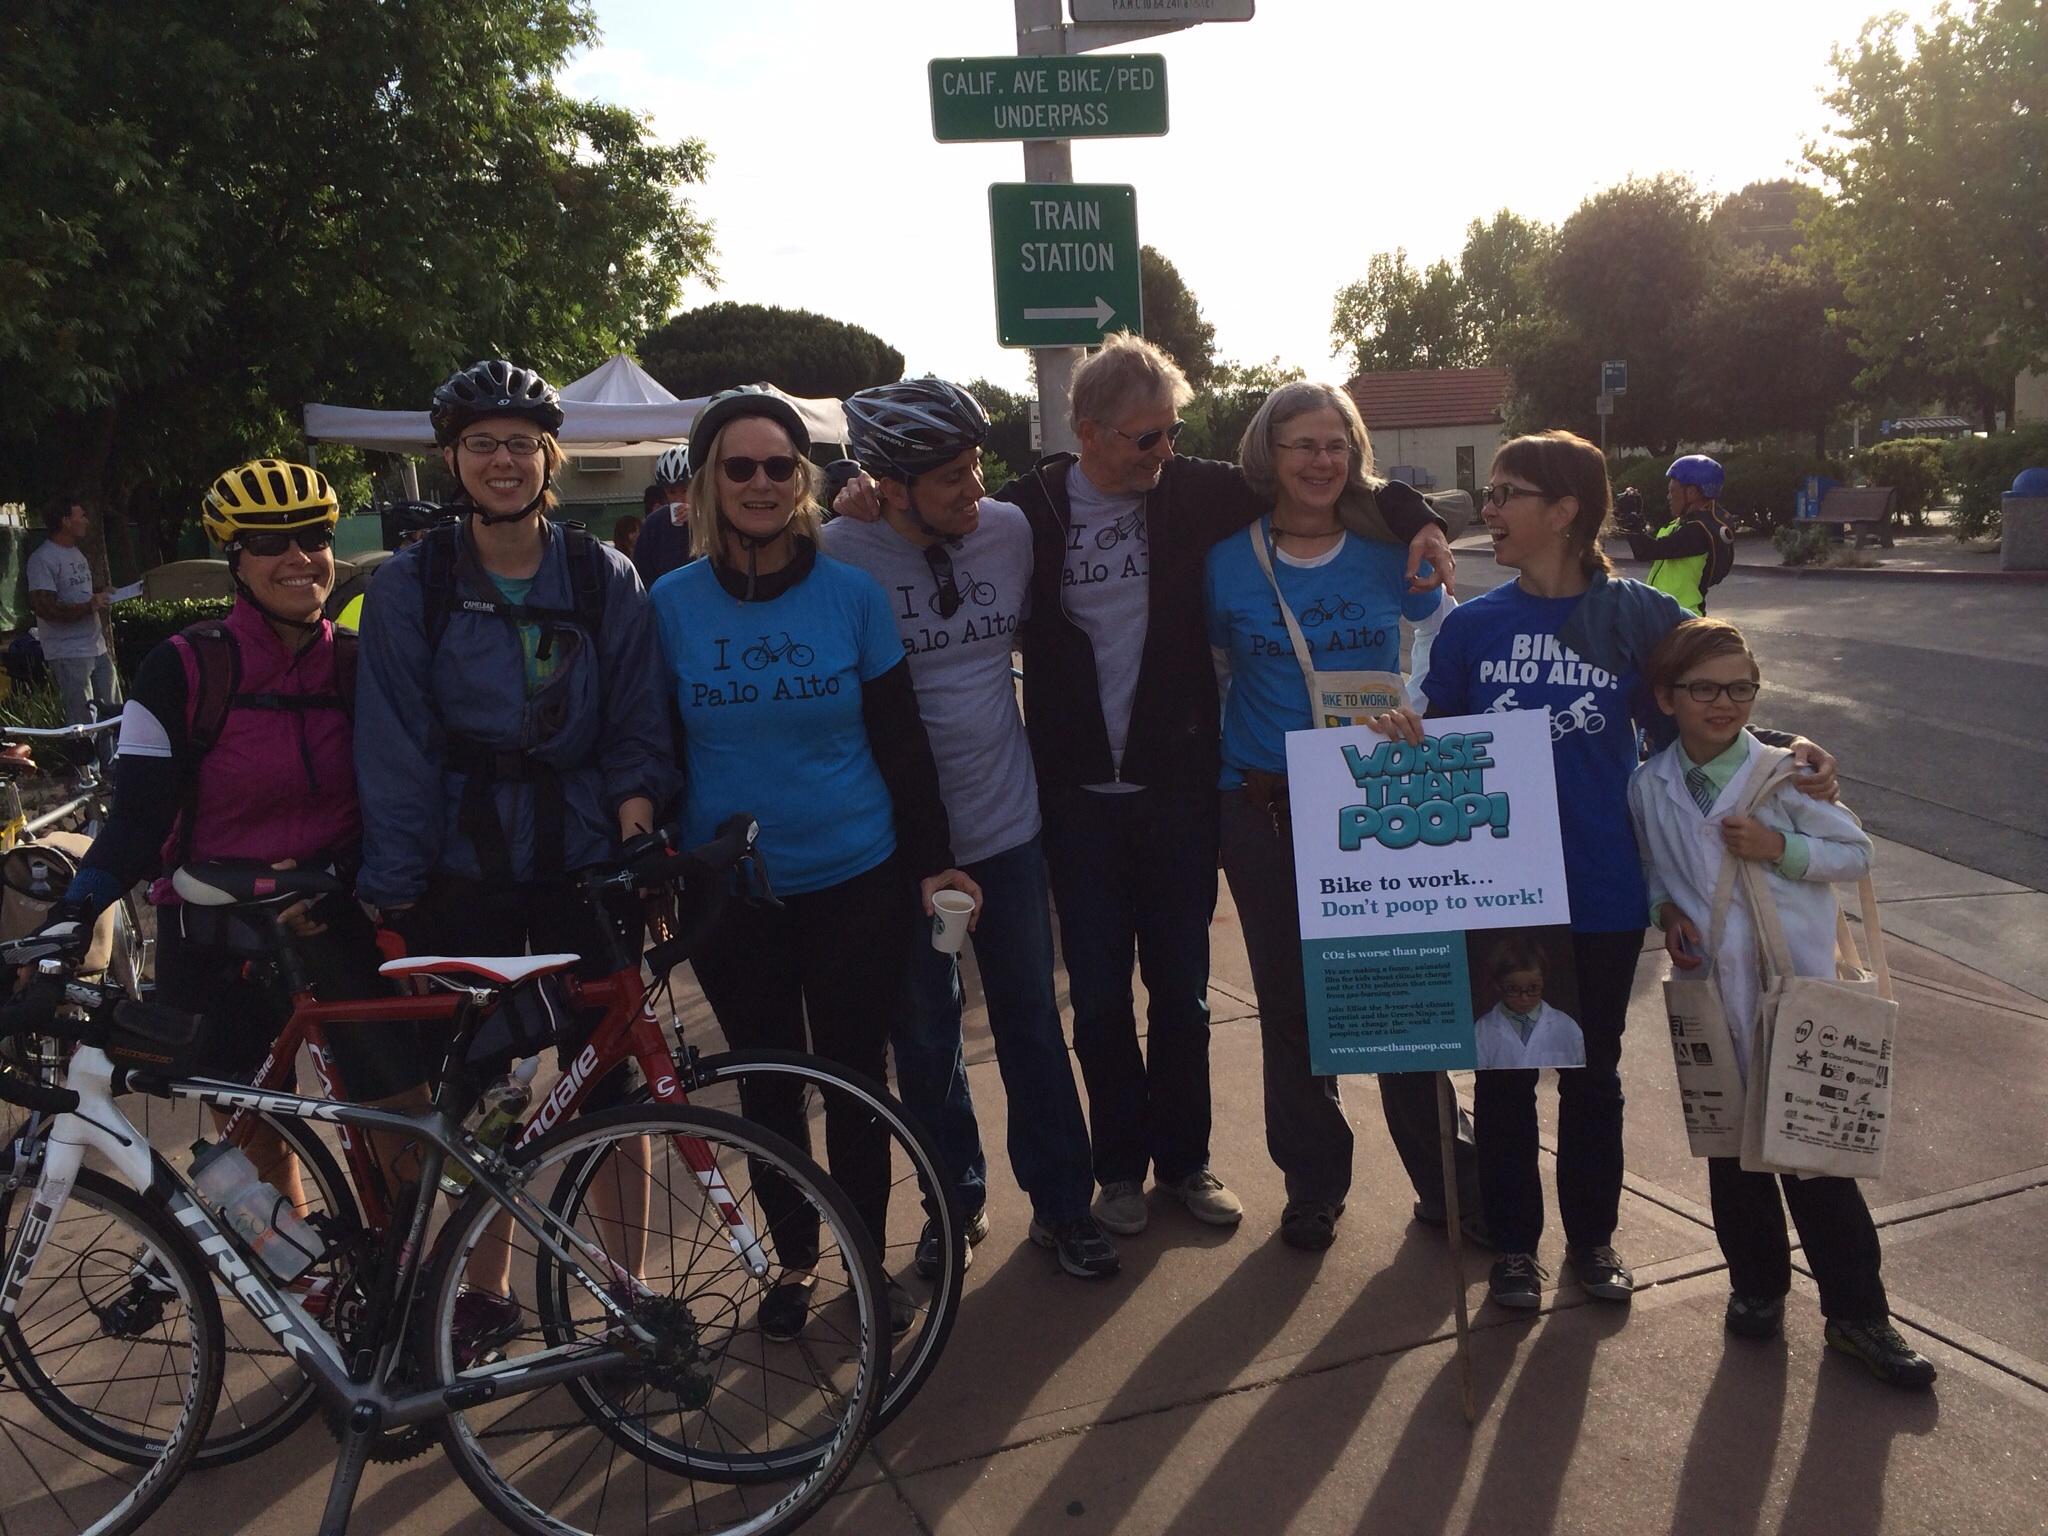 Elliot & Vanessa with team Bike Palo Alto - including Kathy Durham, Mayor Nancy Shepherd, Chief Transportation Official Jaime Rodriguez, and City Manager Jim Keene.